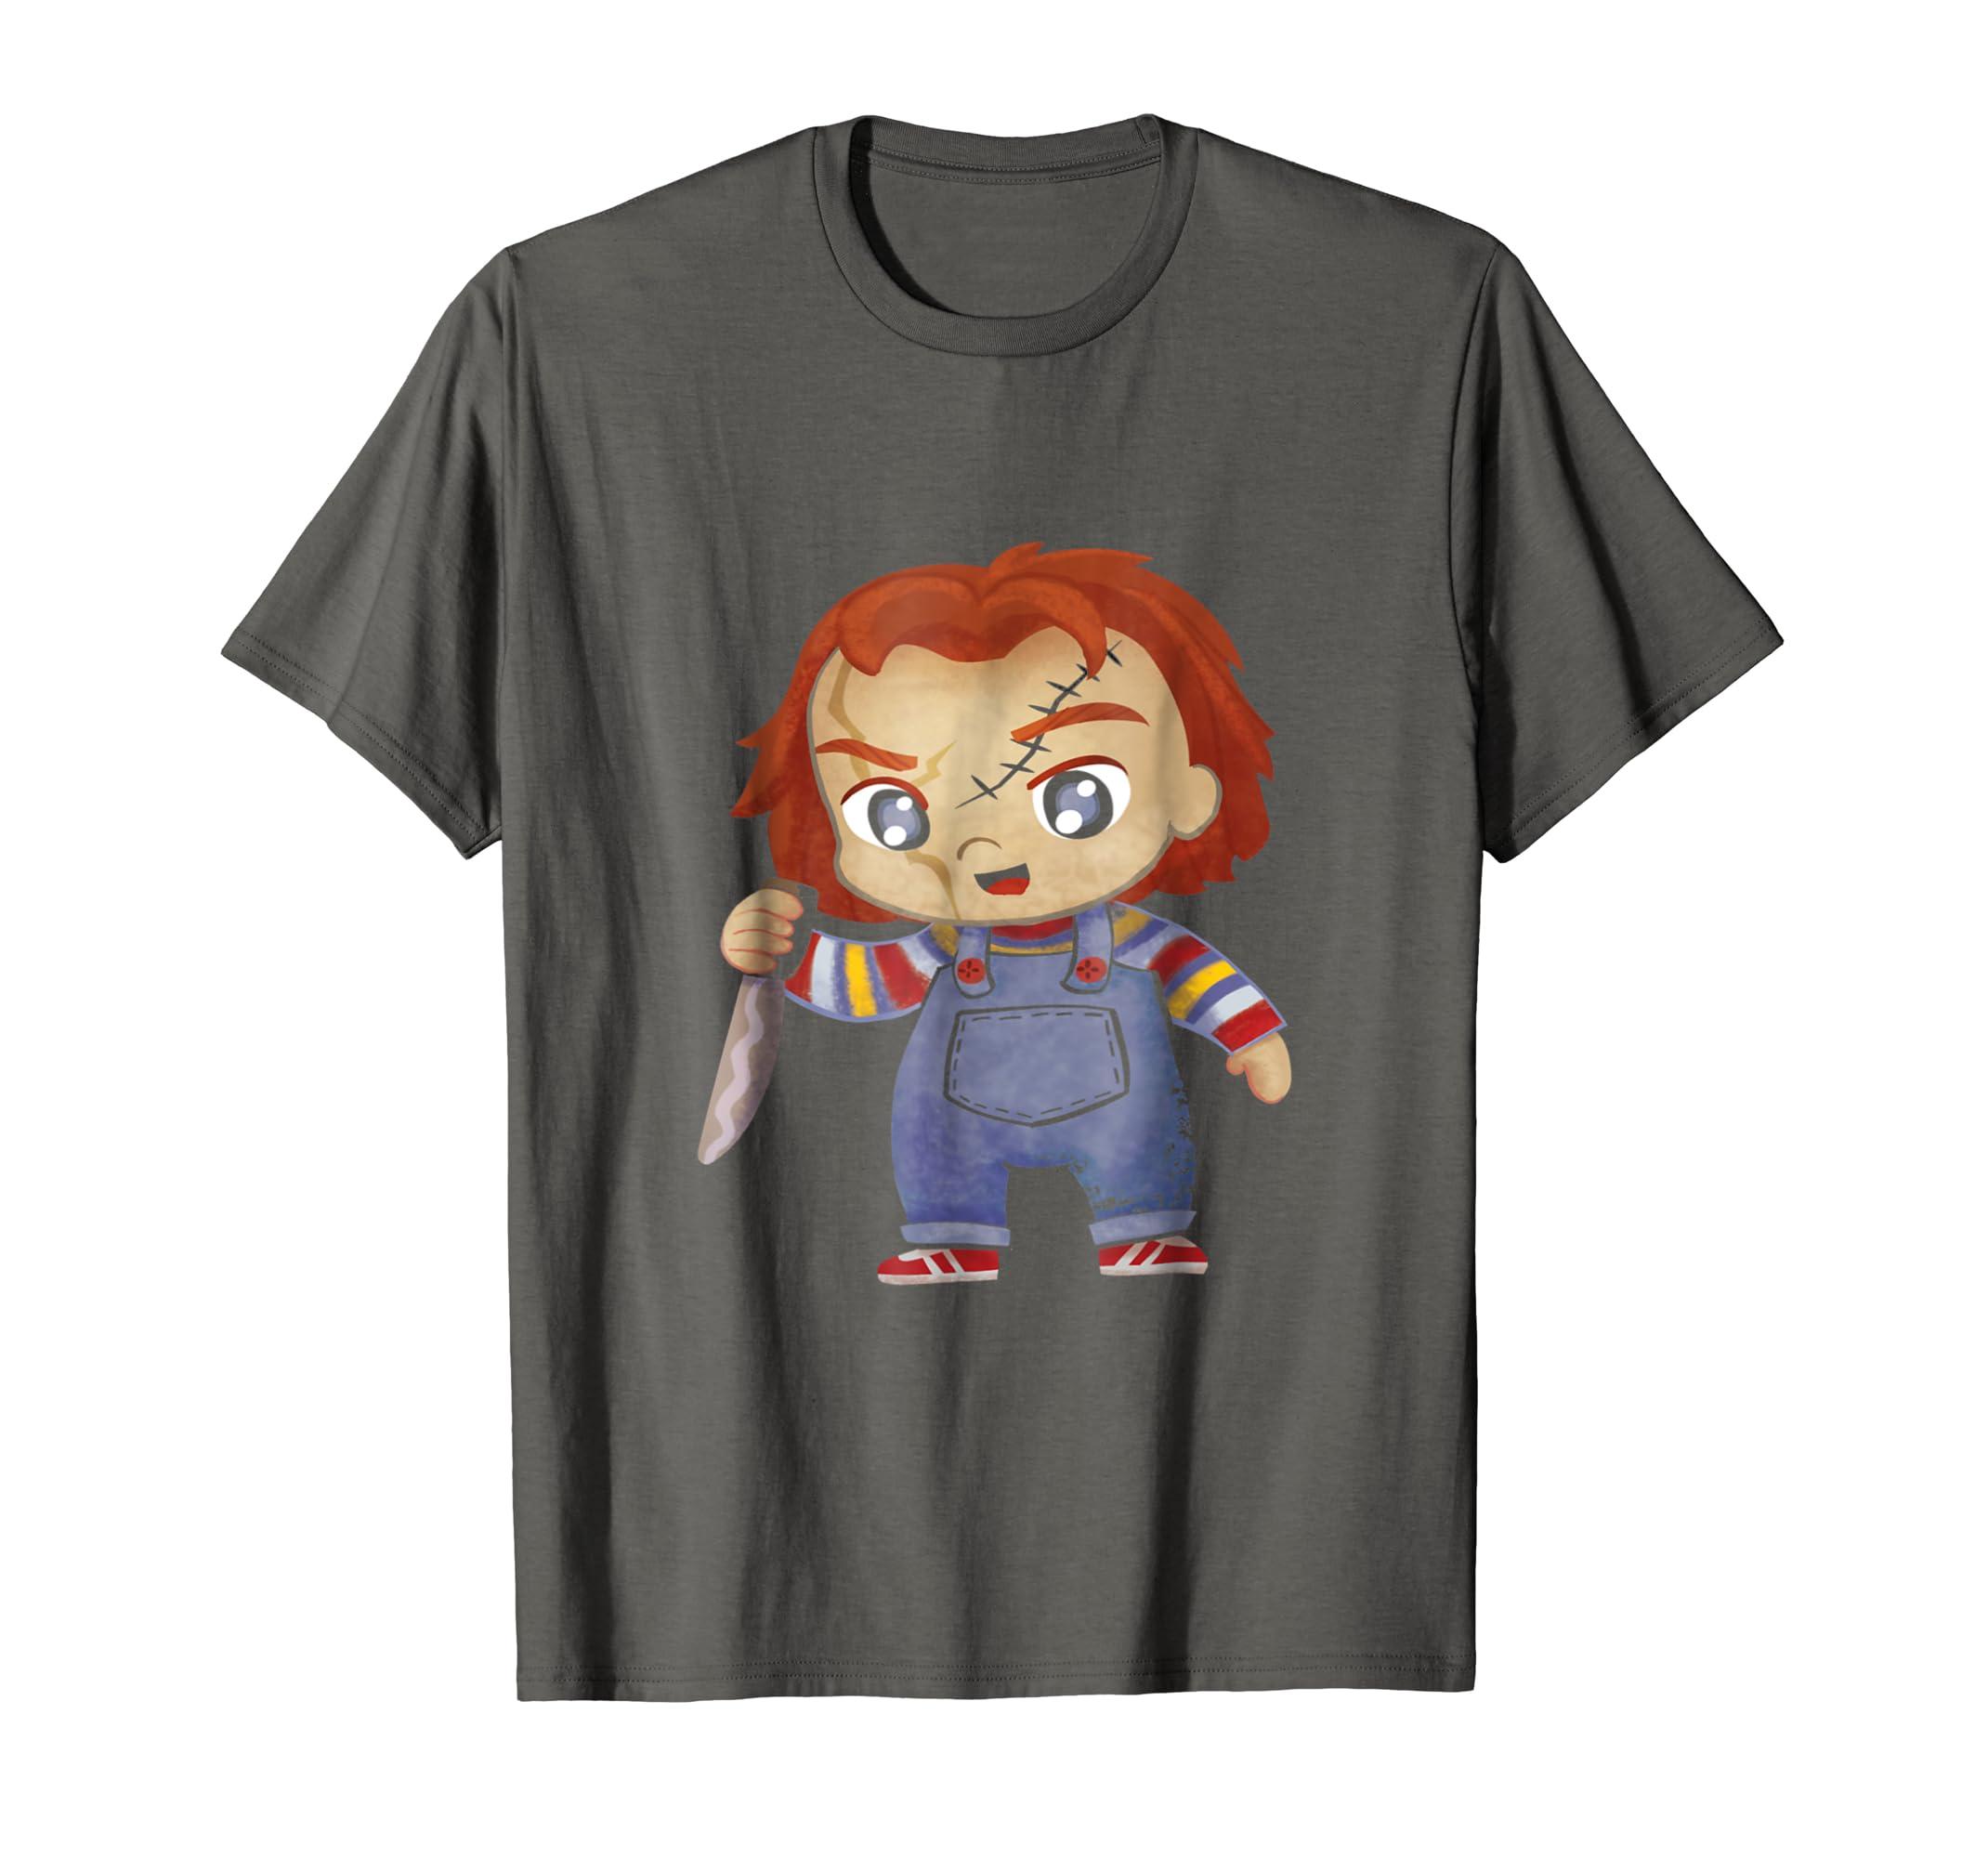 d2c44ff1 Amazon.com: HC Chucky Childs Play Halloween costume t shirt: Clothing